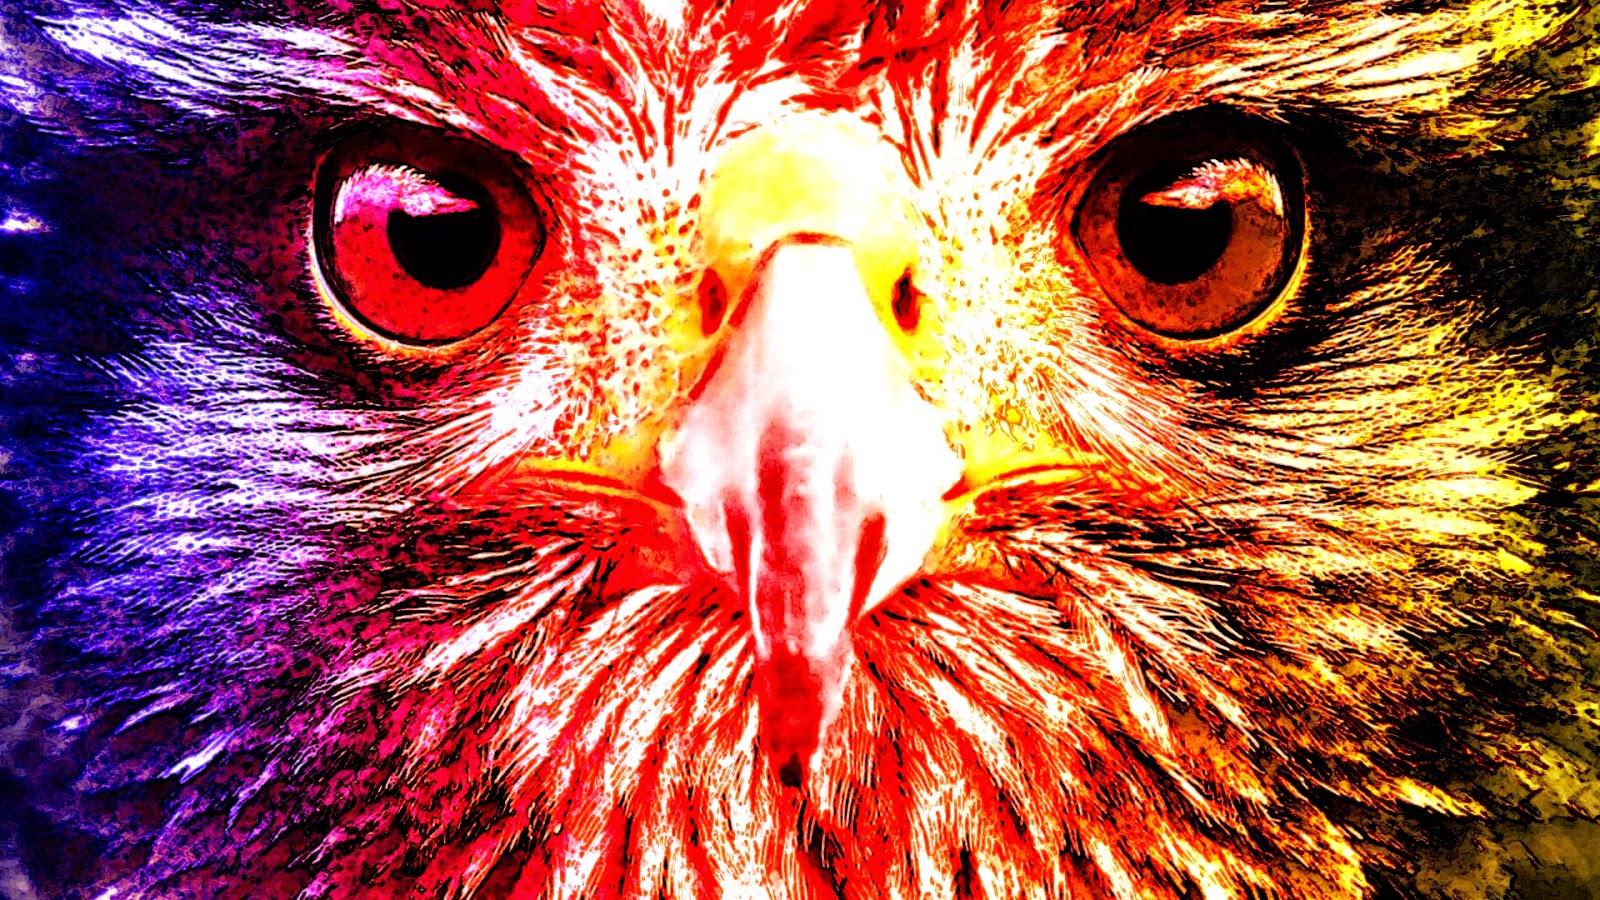 Sfondi desktop animali wallpapers animals digitalmatt for Foto desktop animali